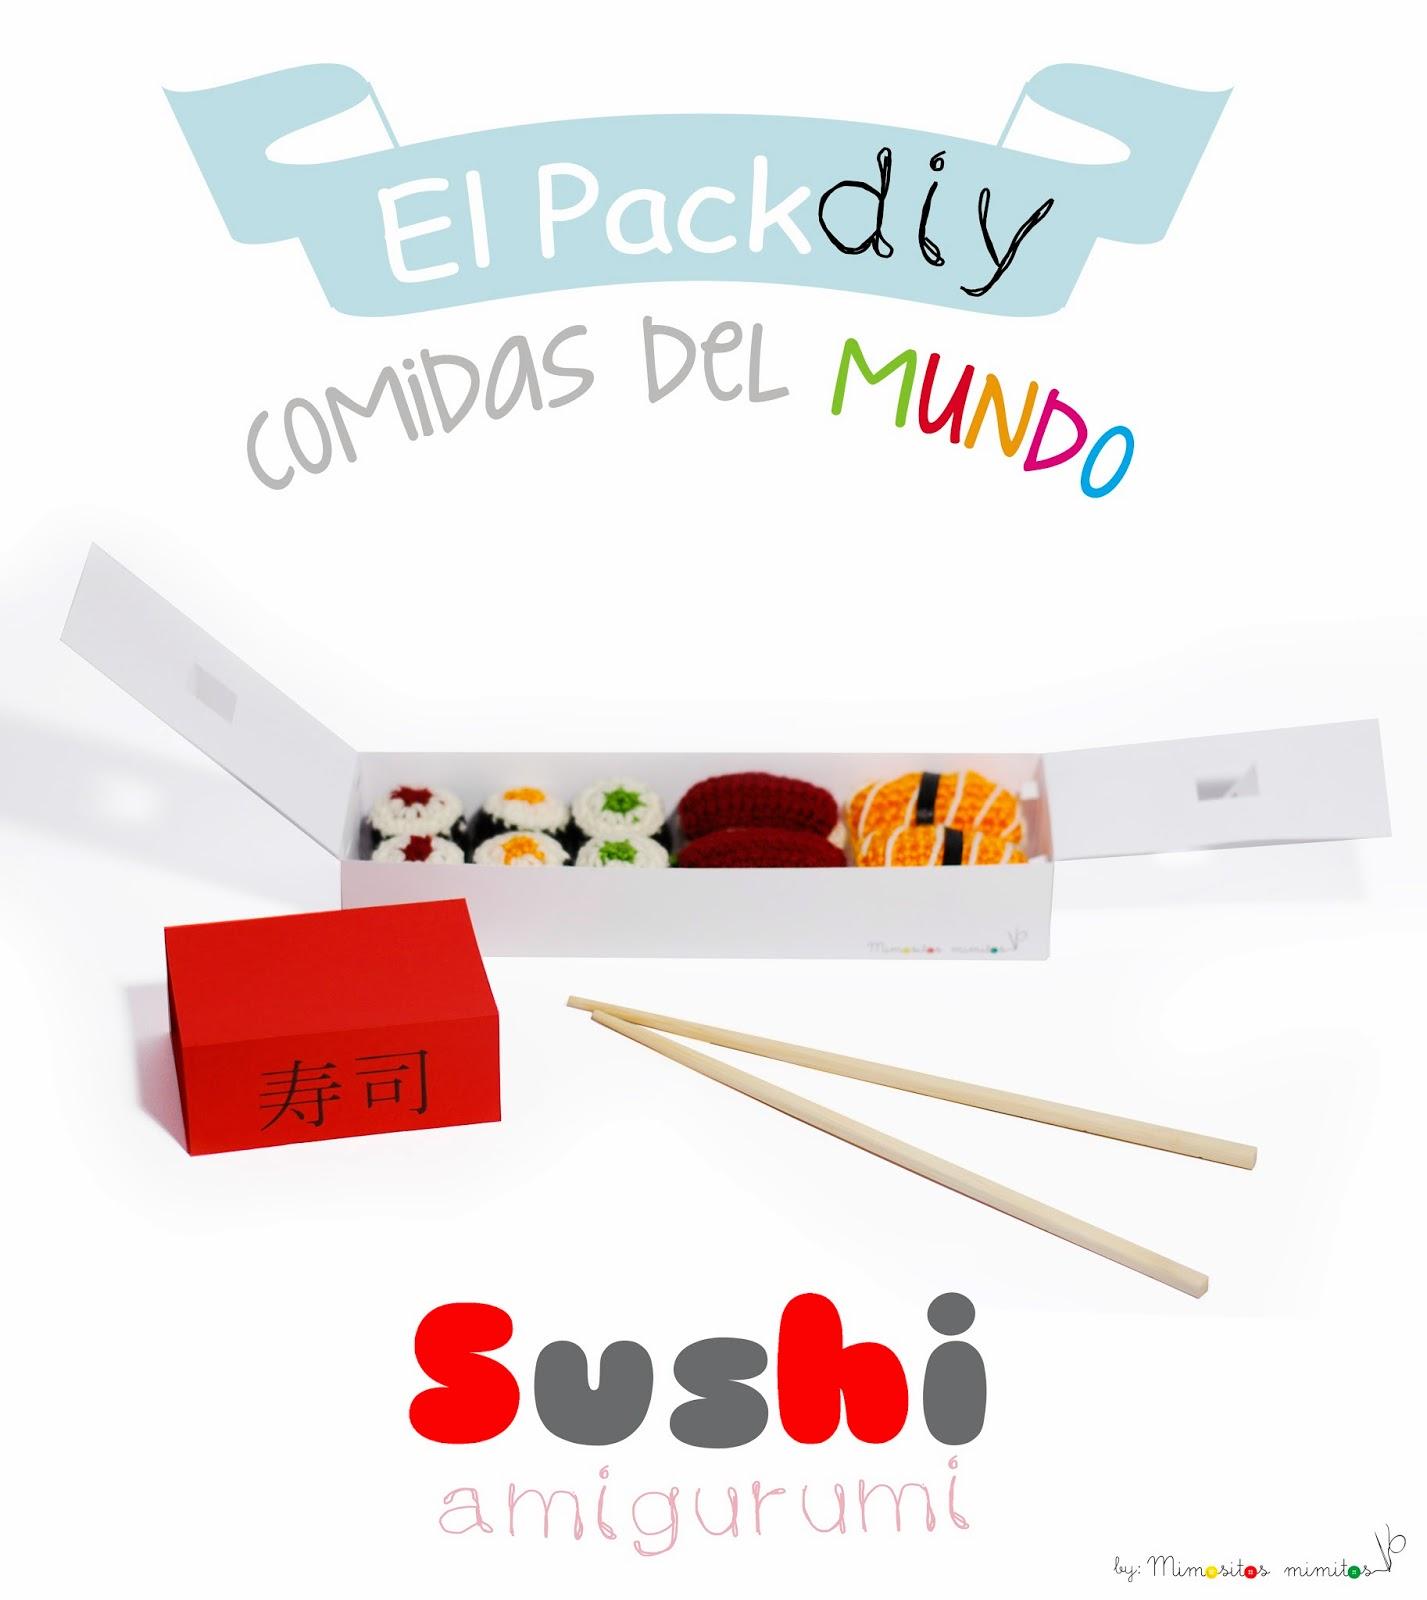 El Pack - Comidas del mundo - Sushi